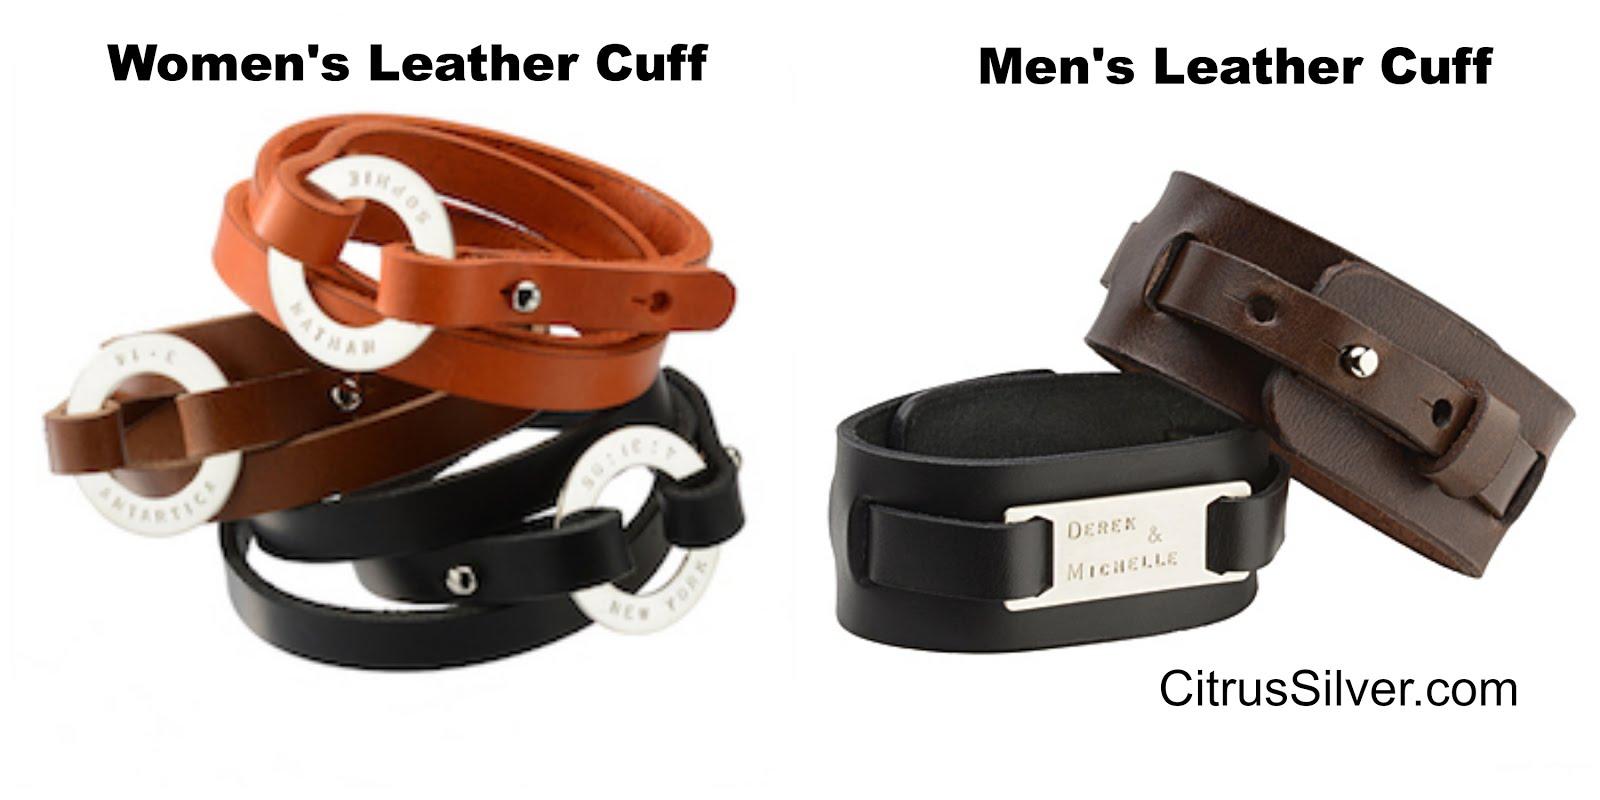 Men's & Women's Leather Cuffs by Citrus Silver.jpg